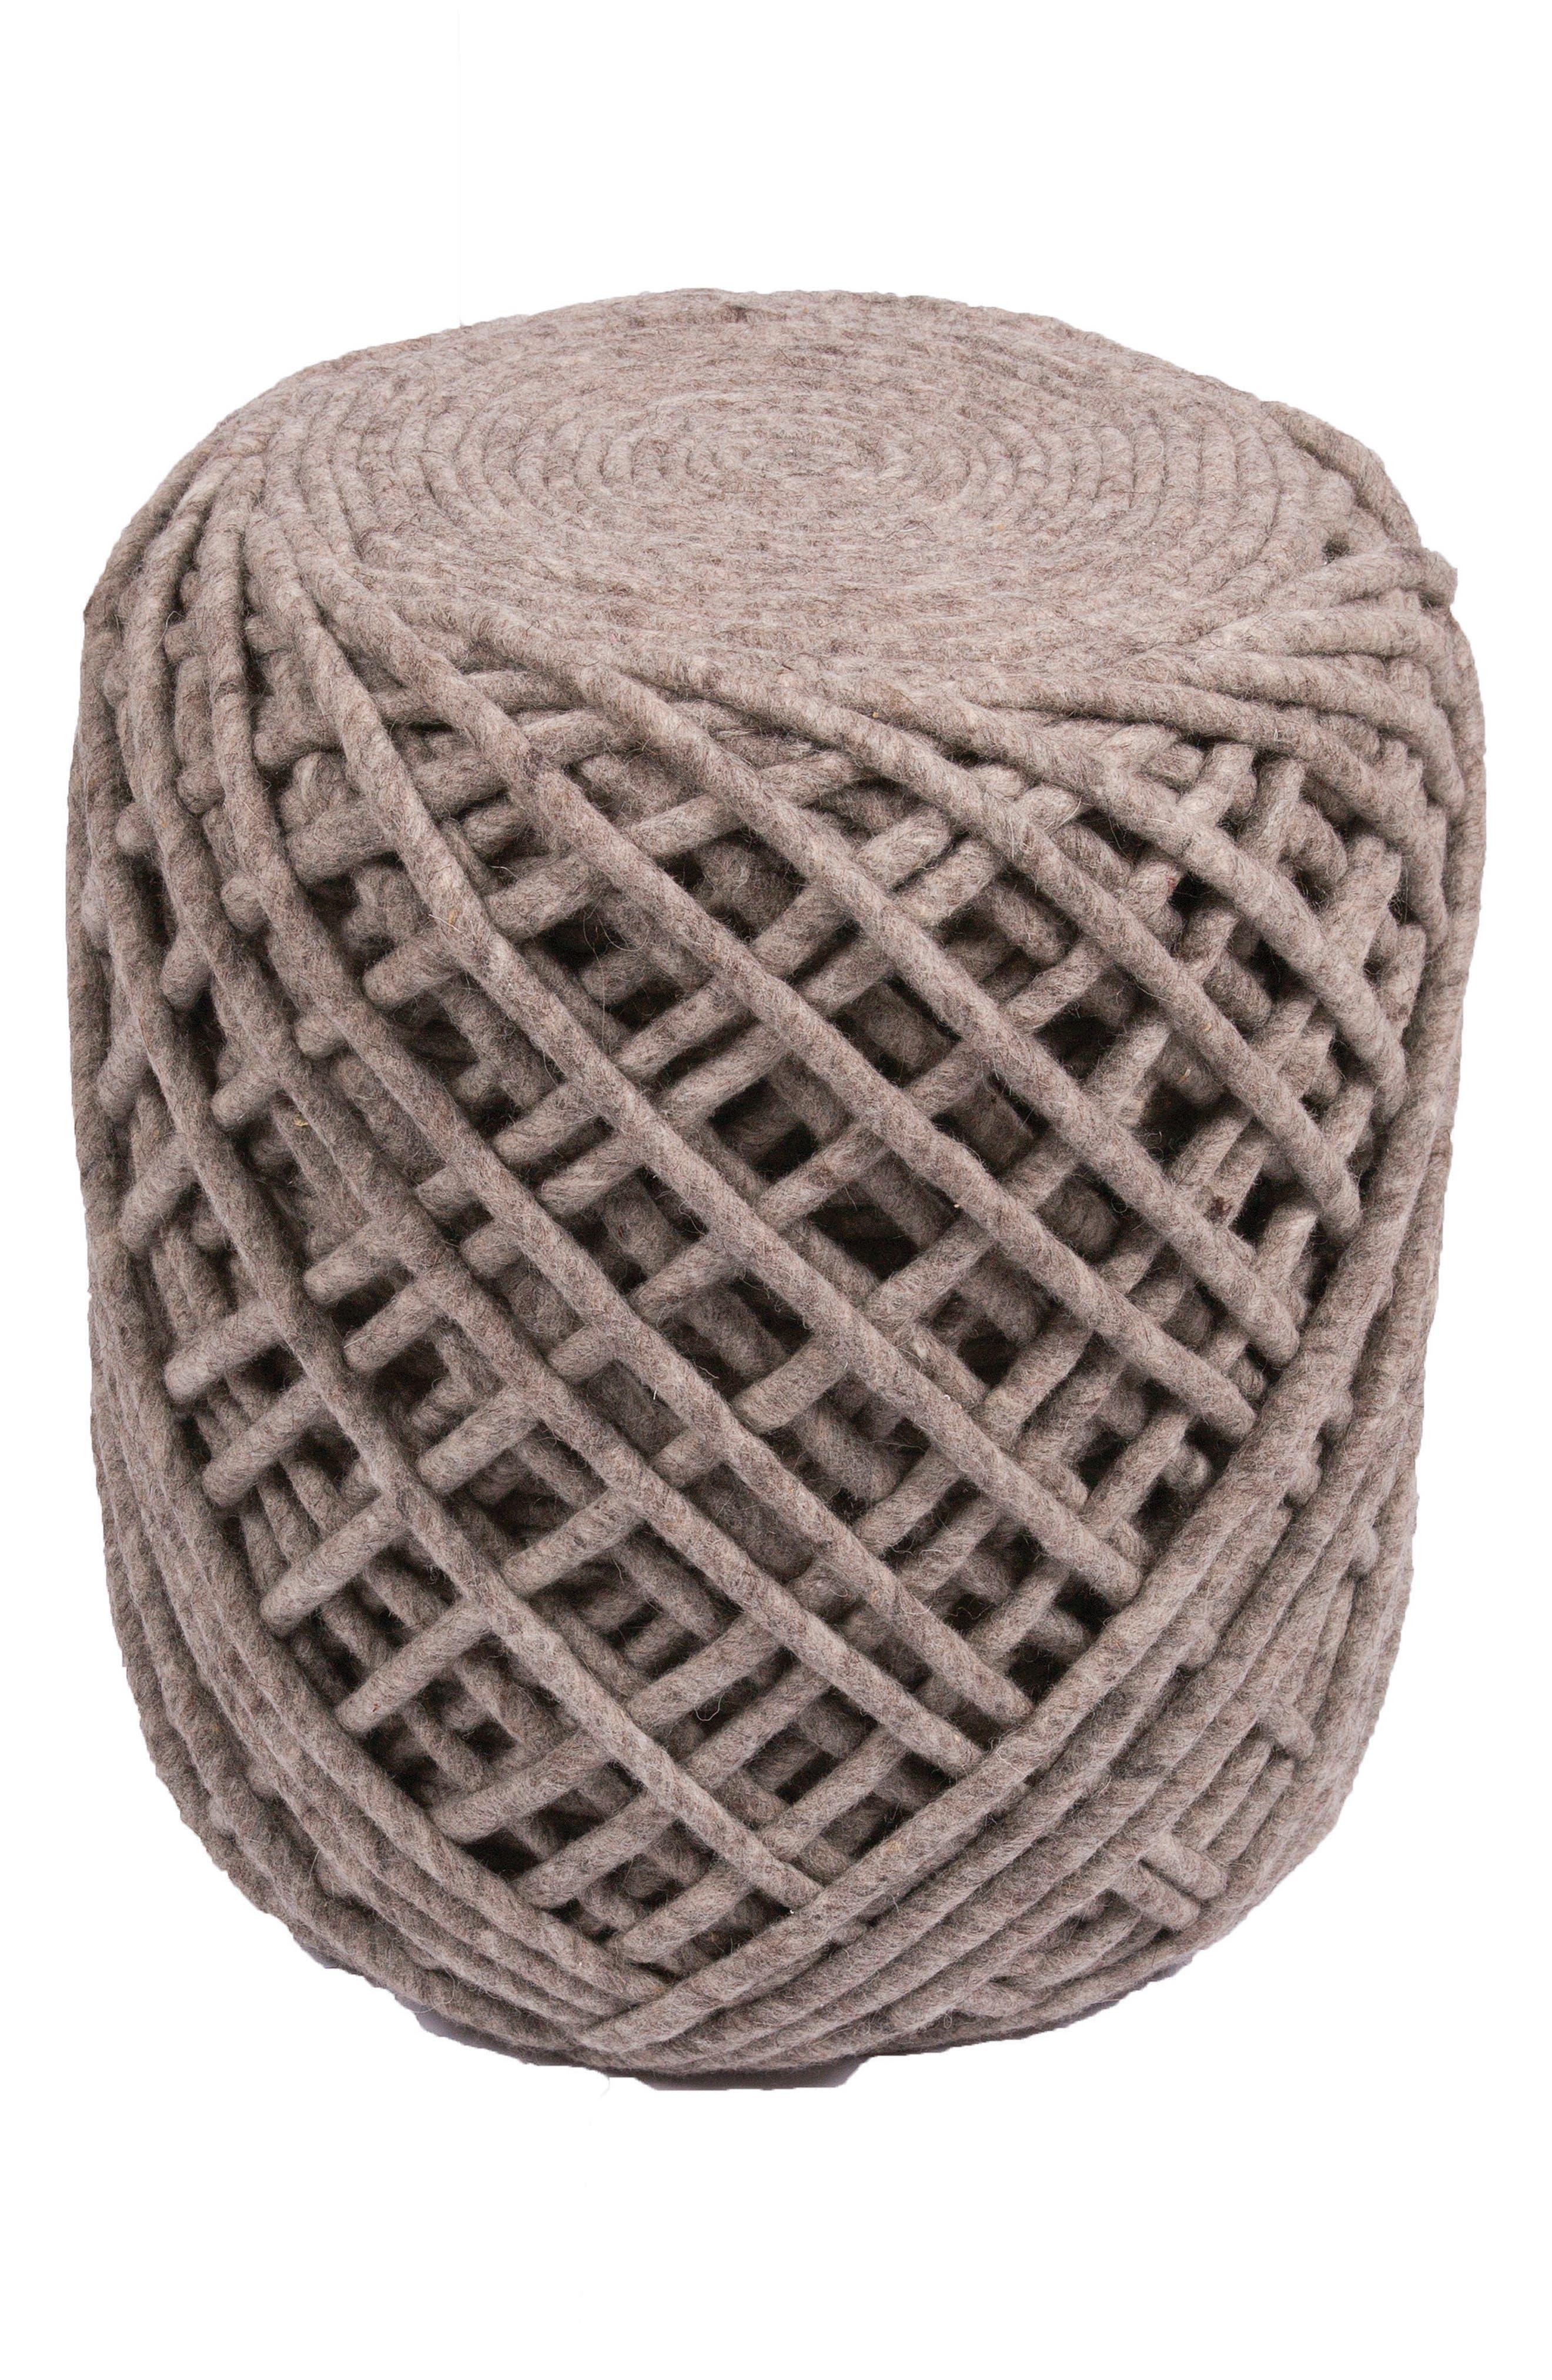 Guna Ash Wool Pouf,                             Main thumbnail 1, color,                             Grey